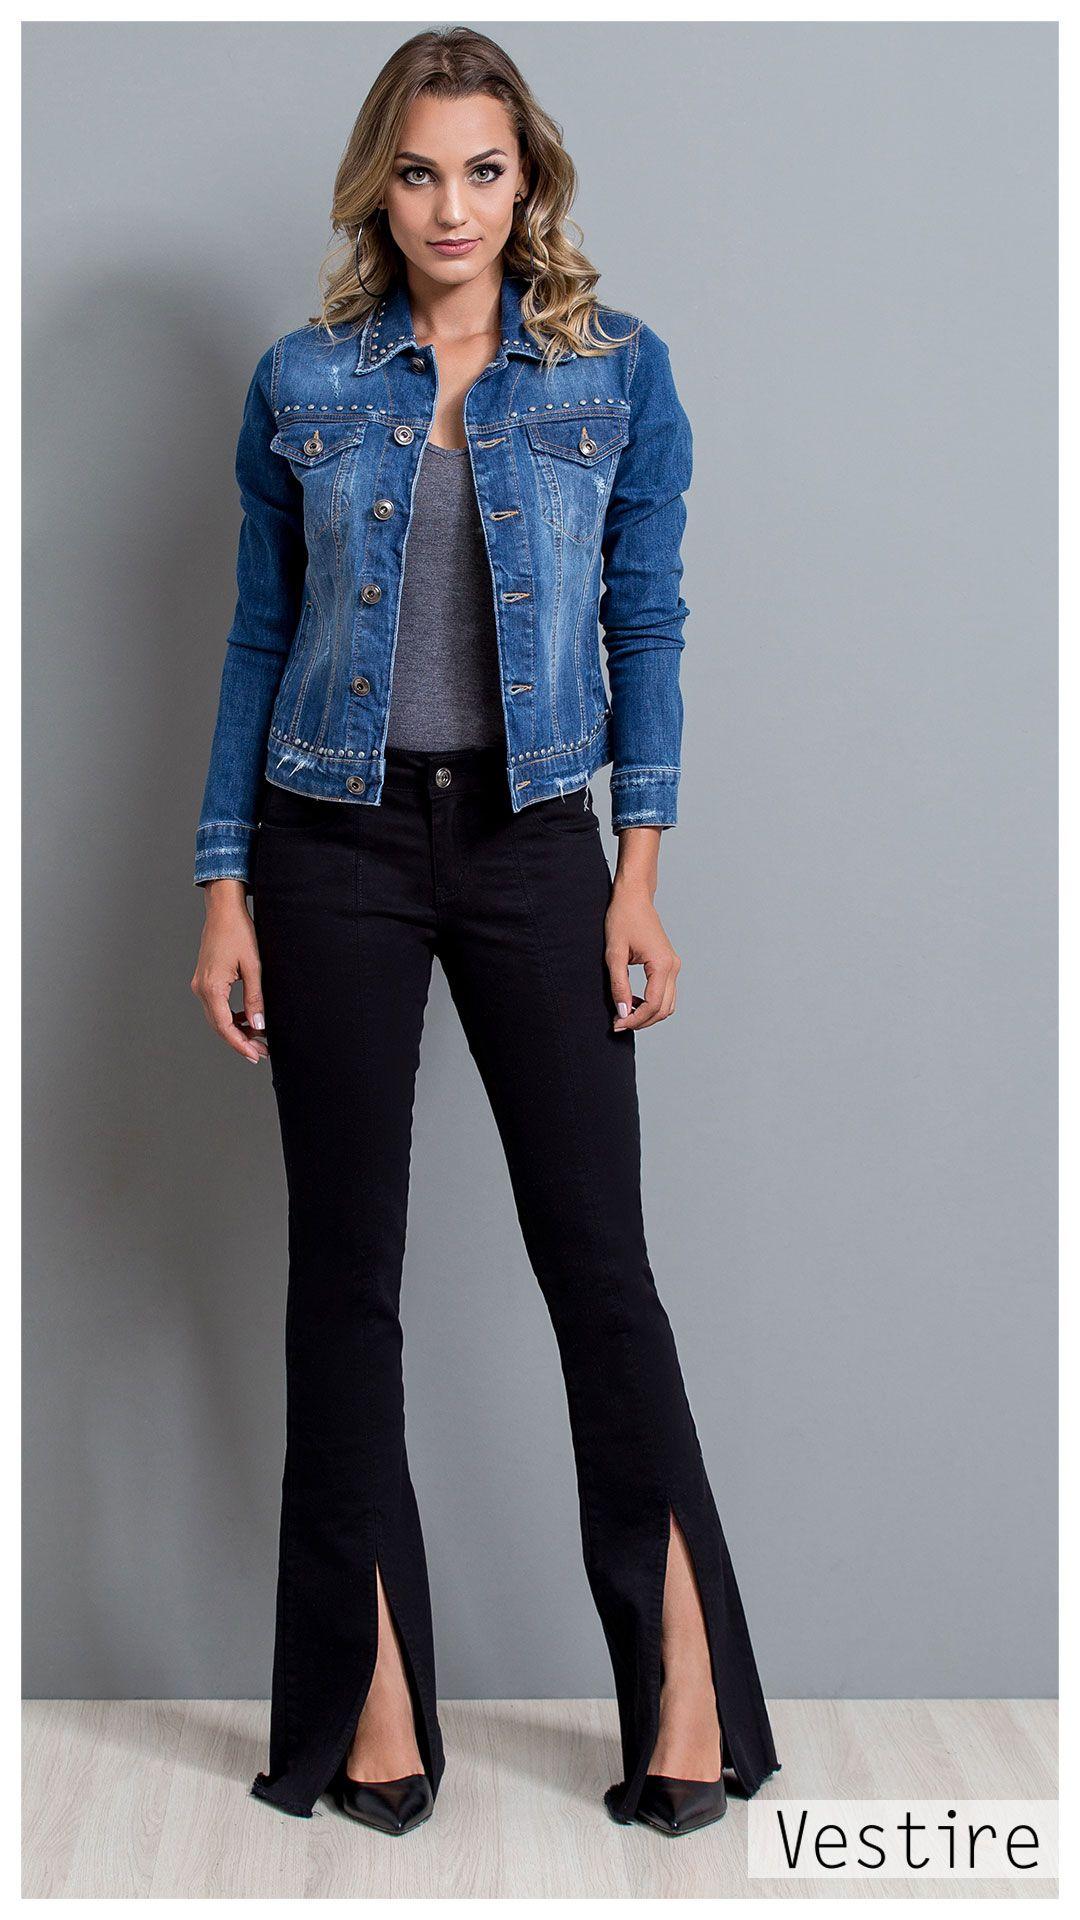 50d2a4d0c Jeans. Vestire Jeans. Moda Feminina. Jeans Feminino. Calça Flare, Sarja  Preta, com Abertura na frente. Jaqueta Jeans